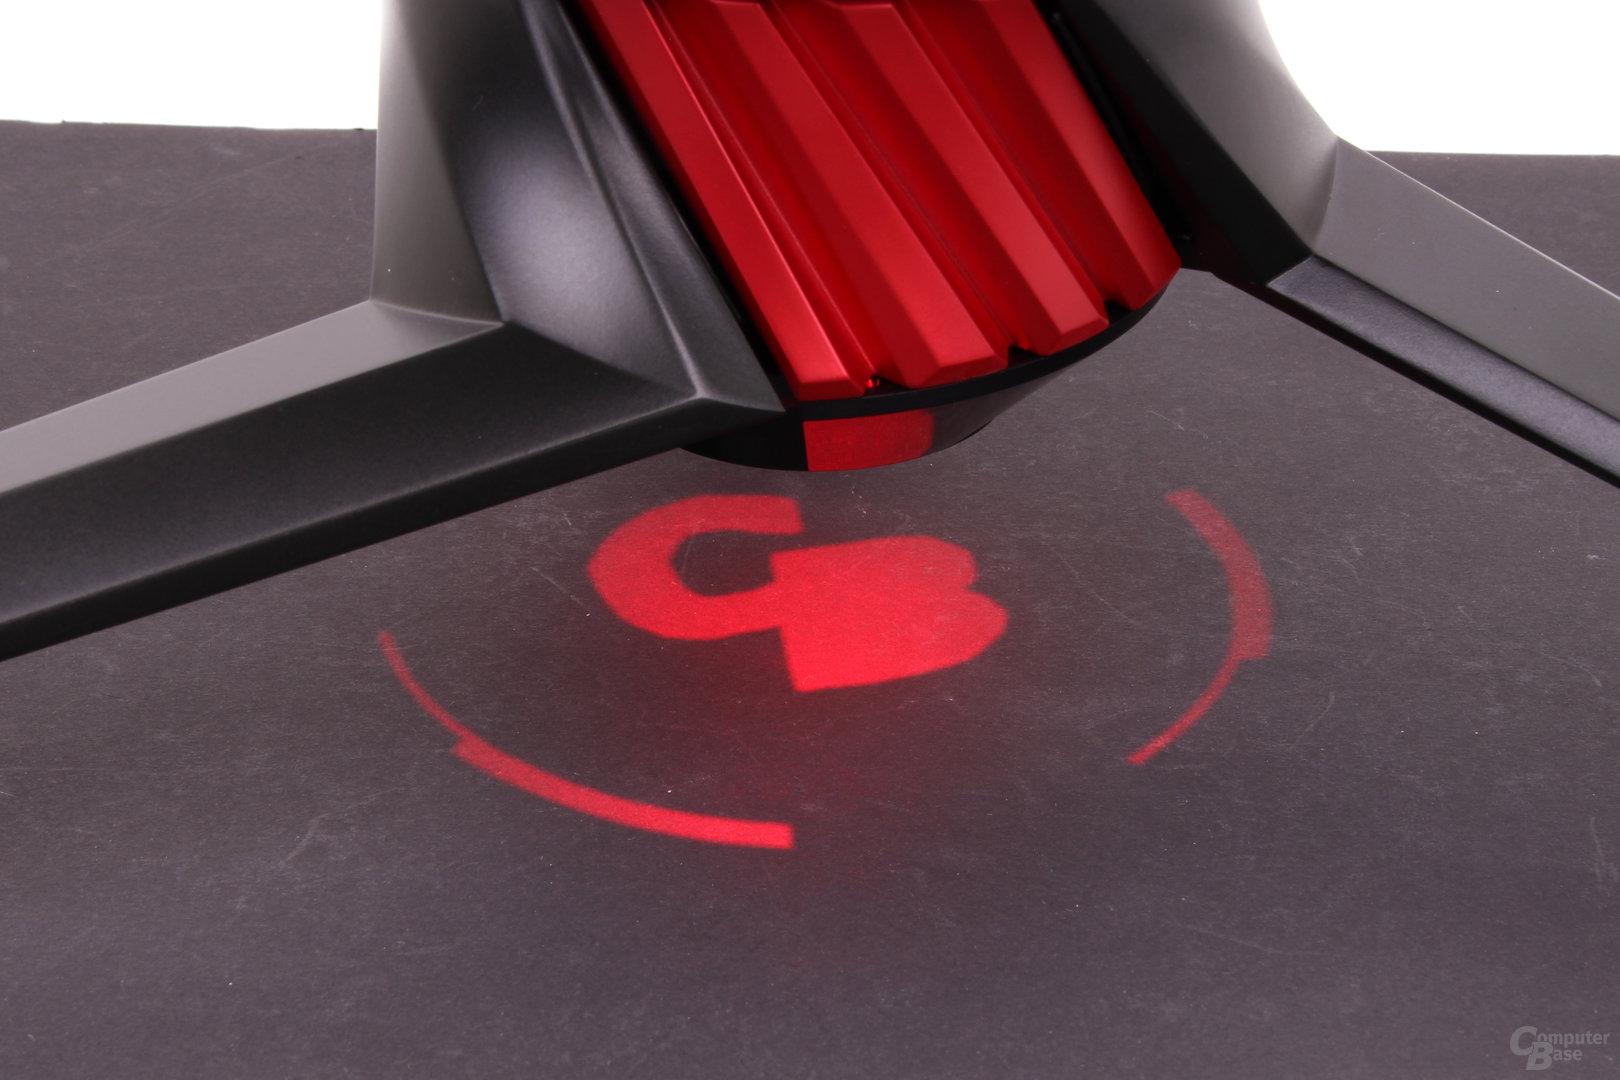 Asus ROG Strix XG35VQ – LED-Beleuchtung